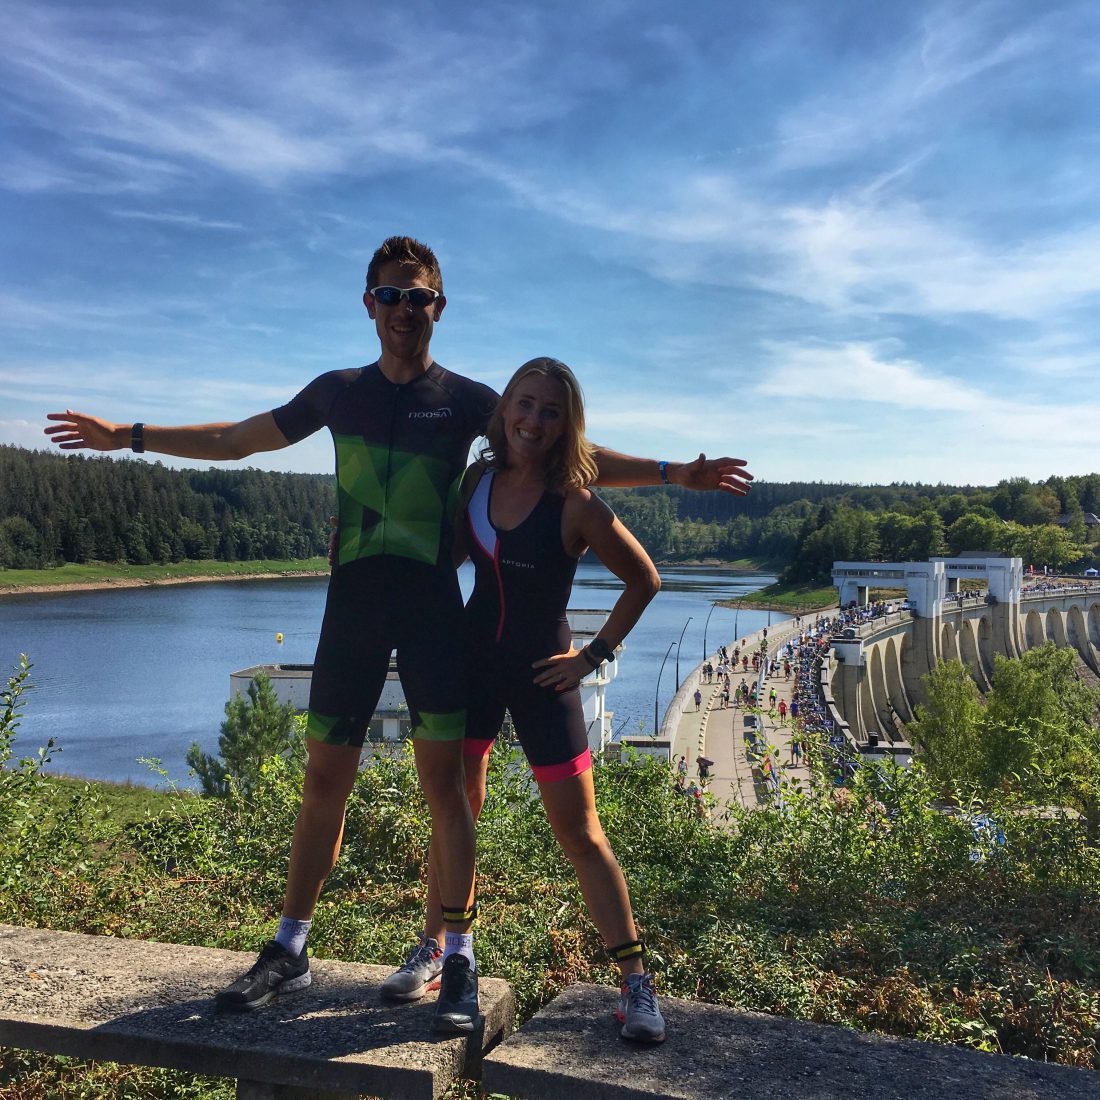 Triathlon ontgroening - wanderlotje